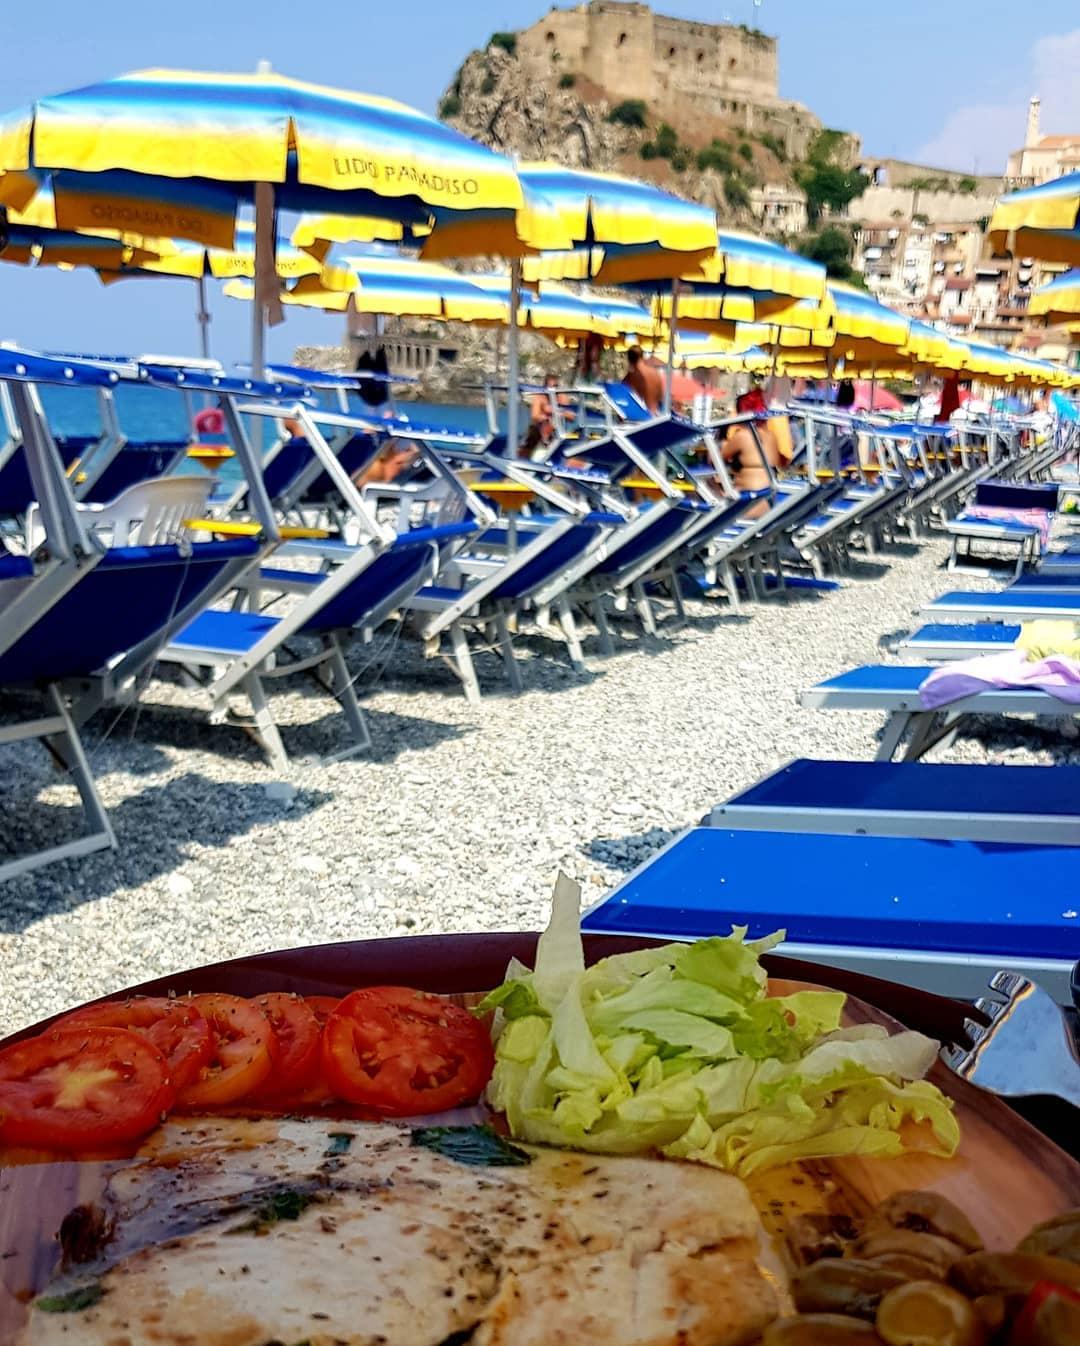 Lido Paradiso Scilla Beach